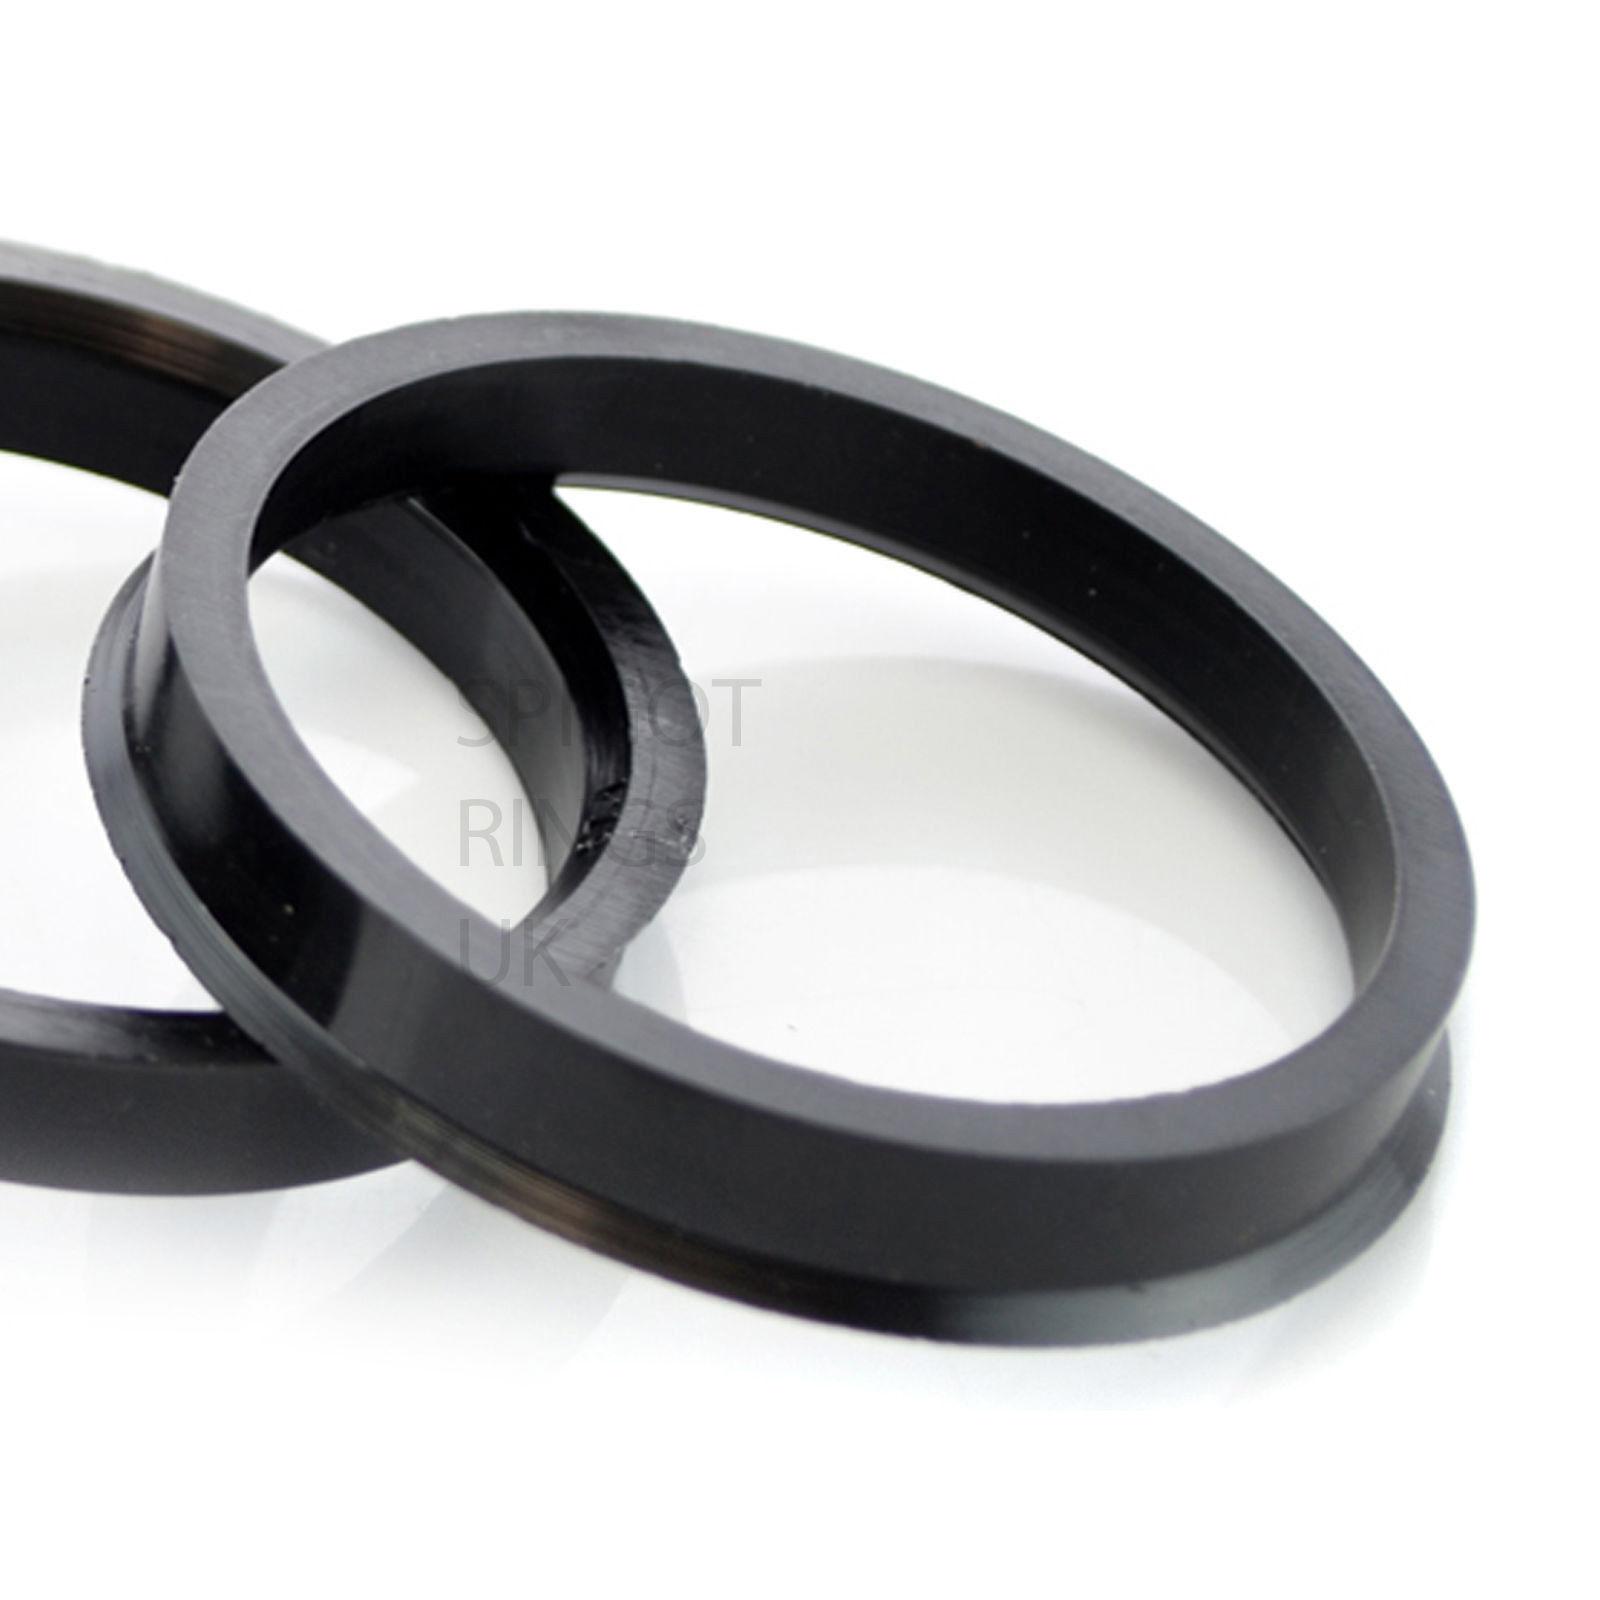 4pc Wheel Hub Centric Rings Spacer  Aluminium Alloy OD=73.1mm ID=54.1mm